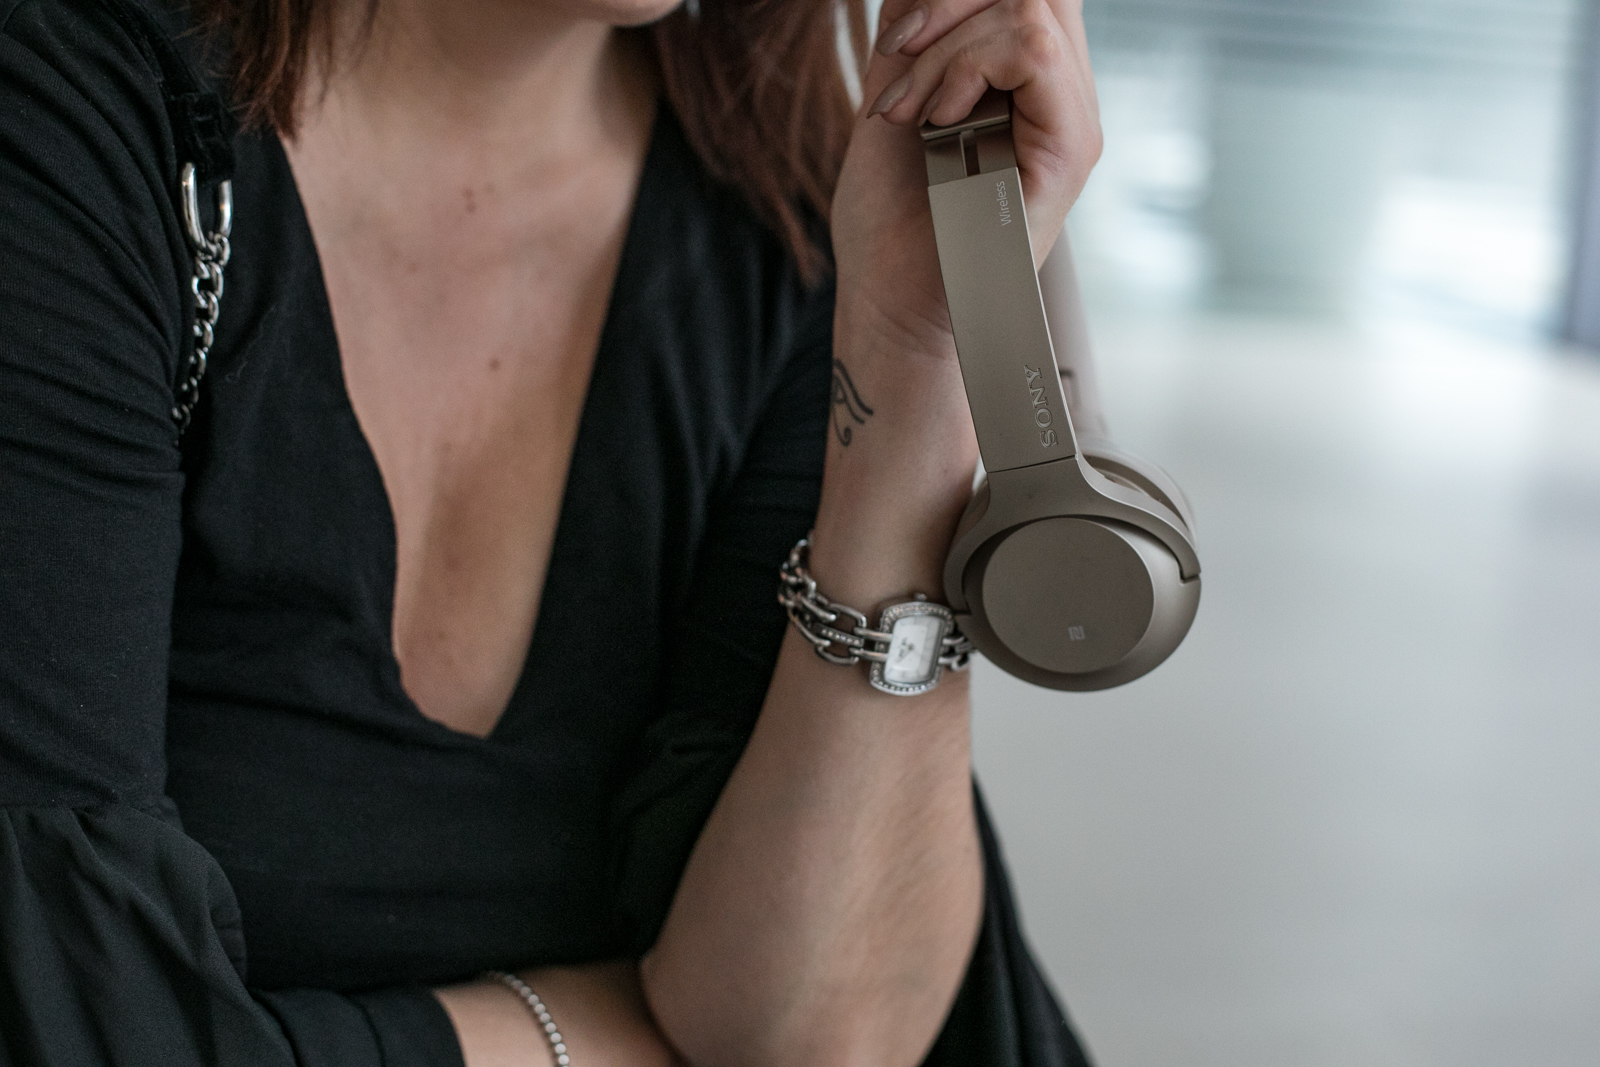 1600-Nadja-Nemetz-NadjaNemetz-Violetfleur-Violet-Fleur-Blog-Wien-WienerBlog-Beauty-Fashion-Lifestyle-Modeblog-Beautyblog-Fotografin-Bloggerin-produkttest-test-sony-kopfhörer-headphones-test-review-bericht-testbericht-3